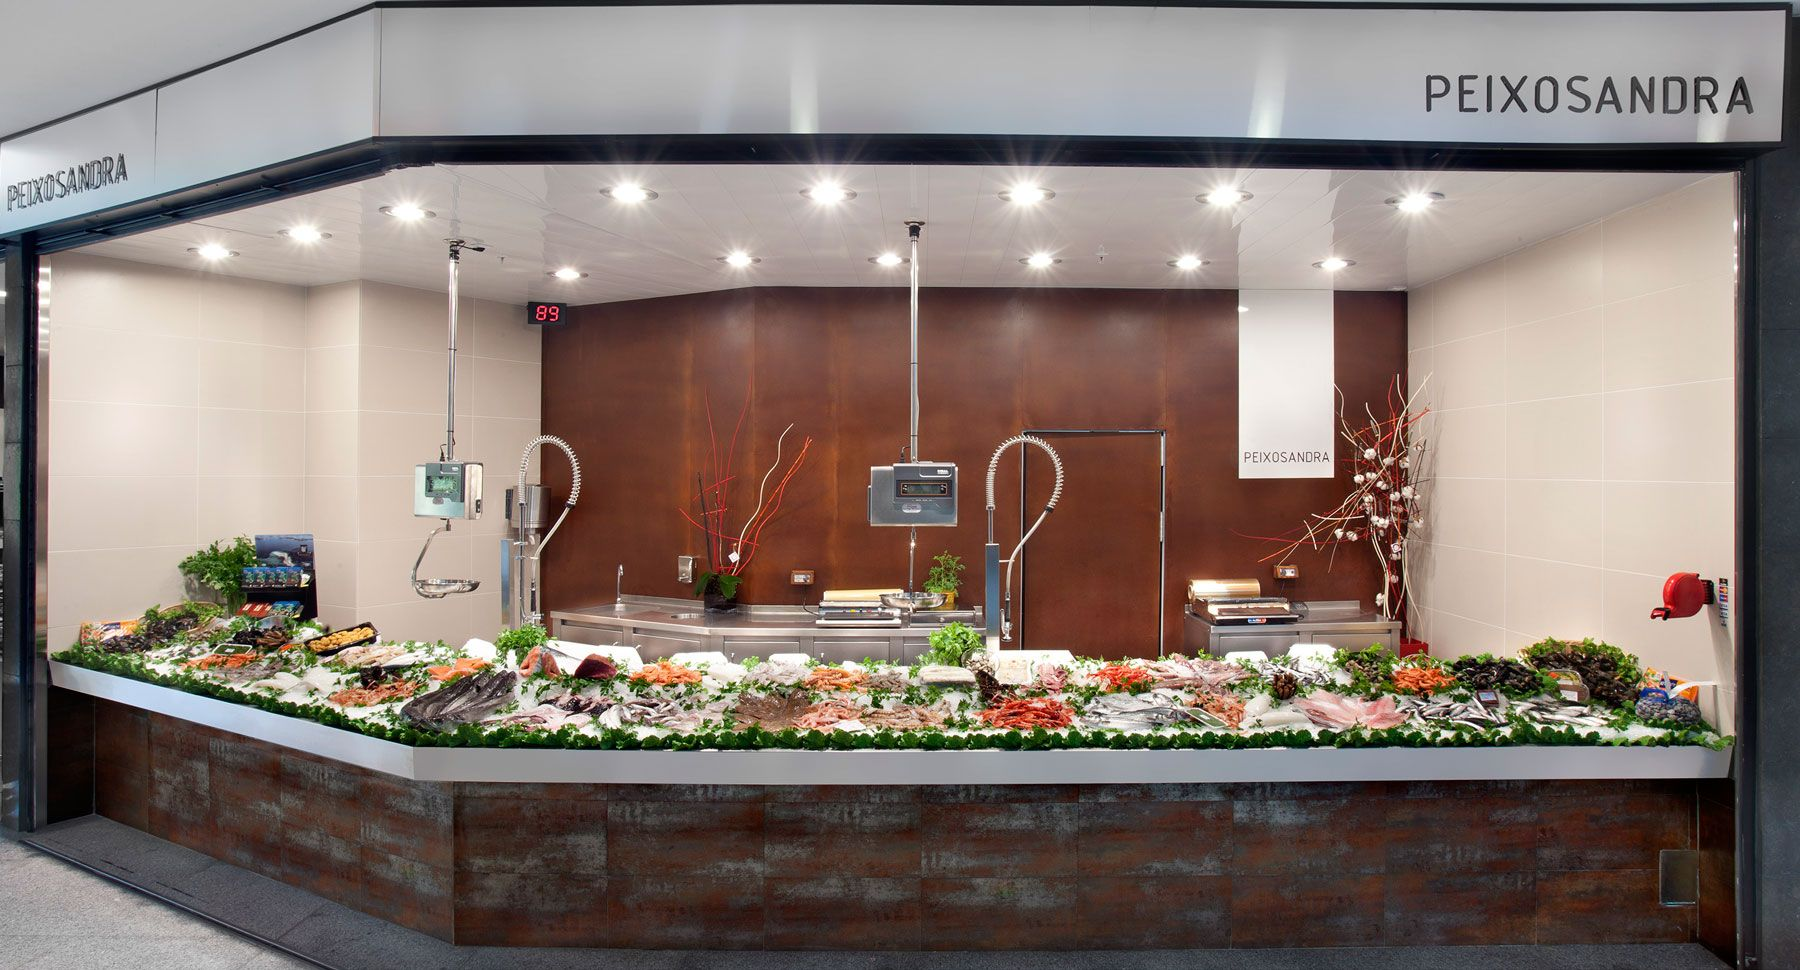 Pescaderia sandra barcelona degustacion mercados paradasdemercado charcuteria carniceria - Mostradores para carniceria ...